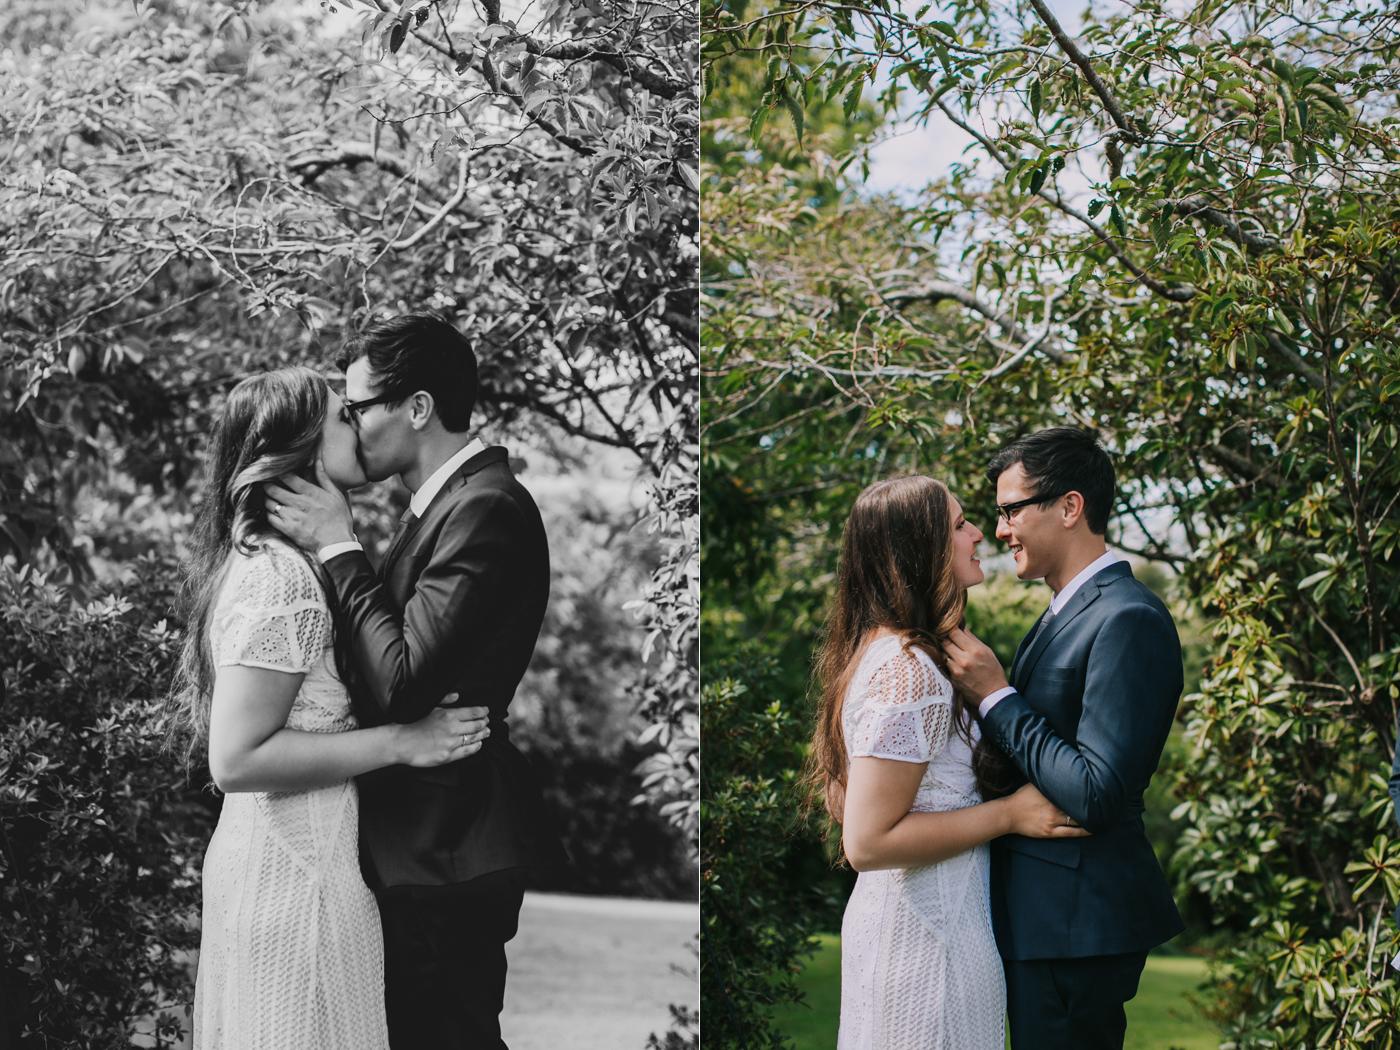 Ariana & Tim - Dunedin, New Zealand Wedding - Destination Wedding - Samantha Heather Photography-101.jpg